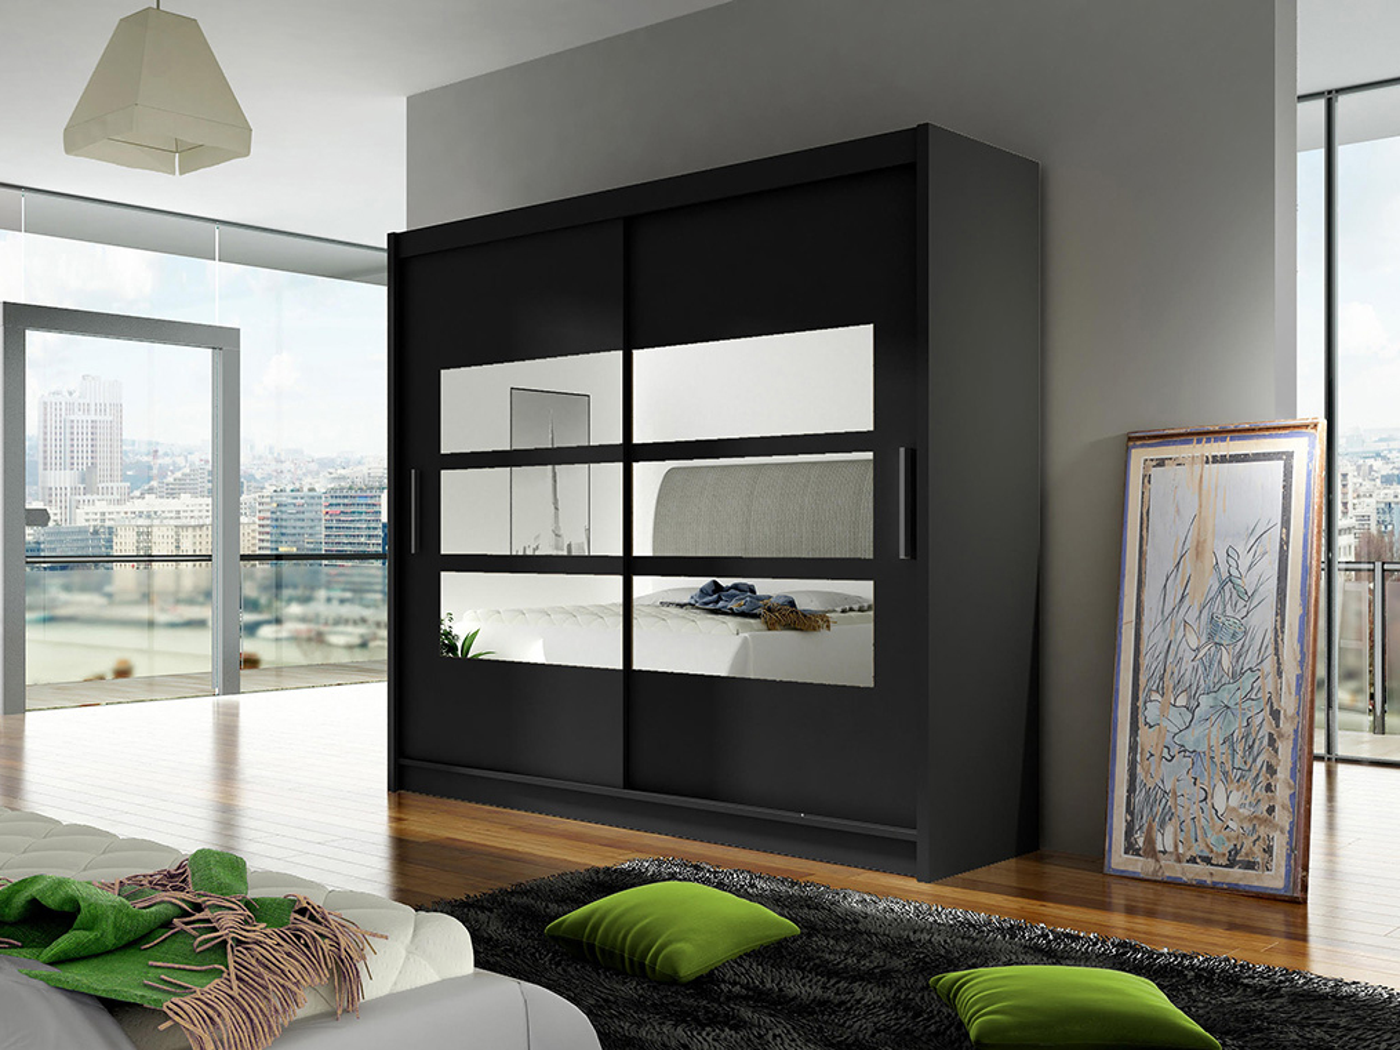 Šatní skříň - Ankon - Bega III černá